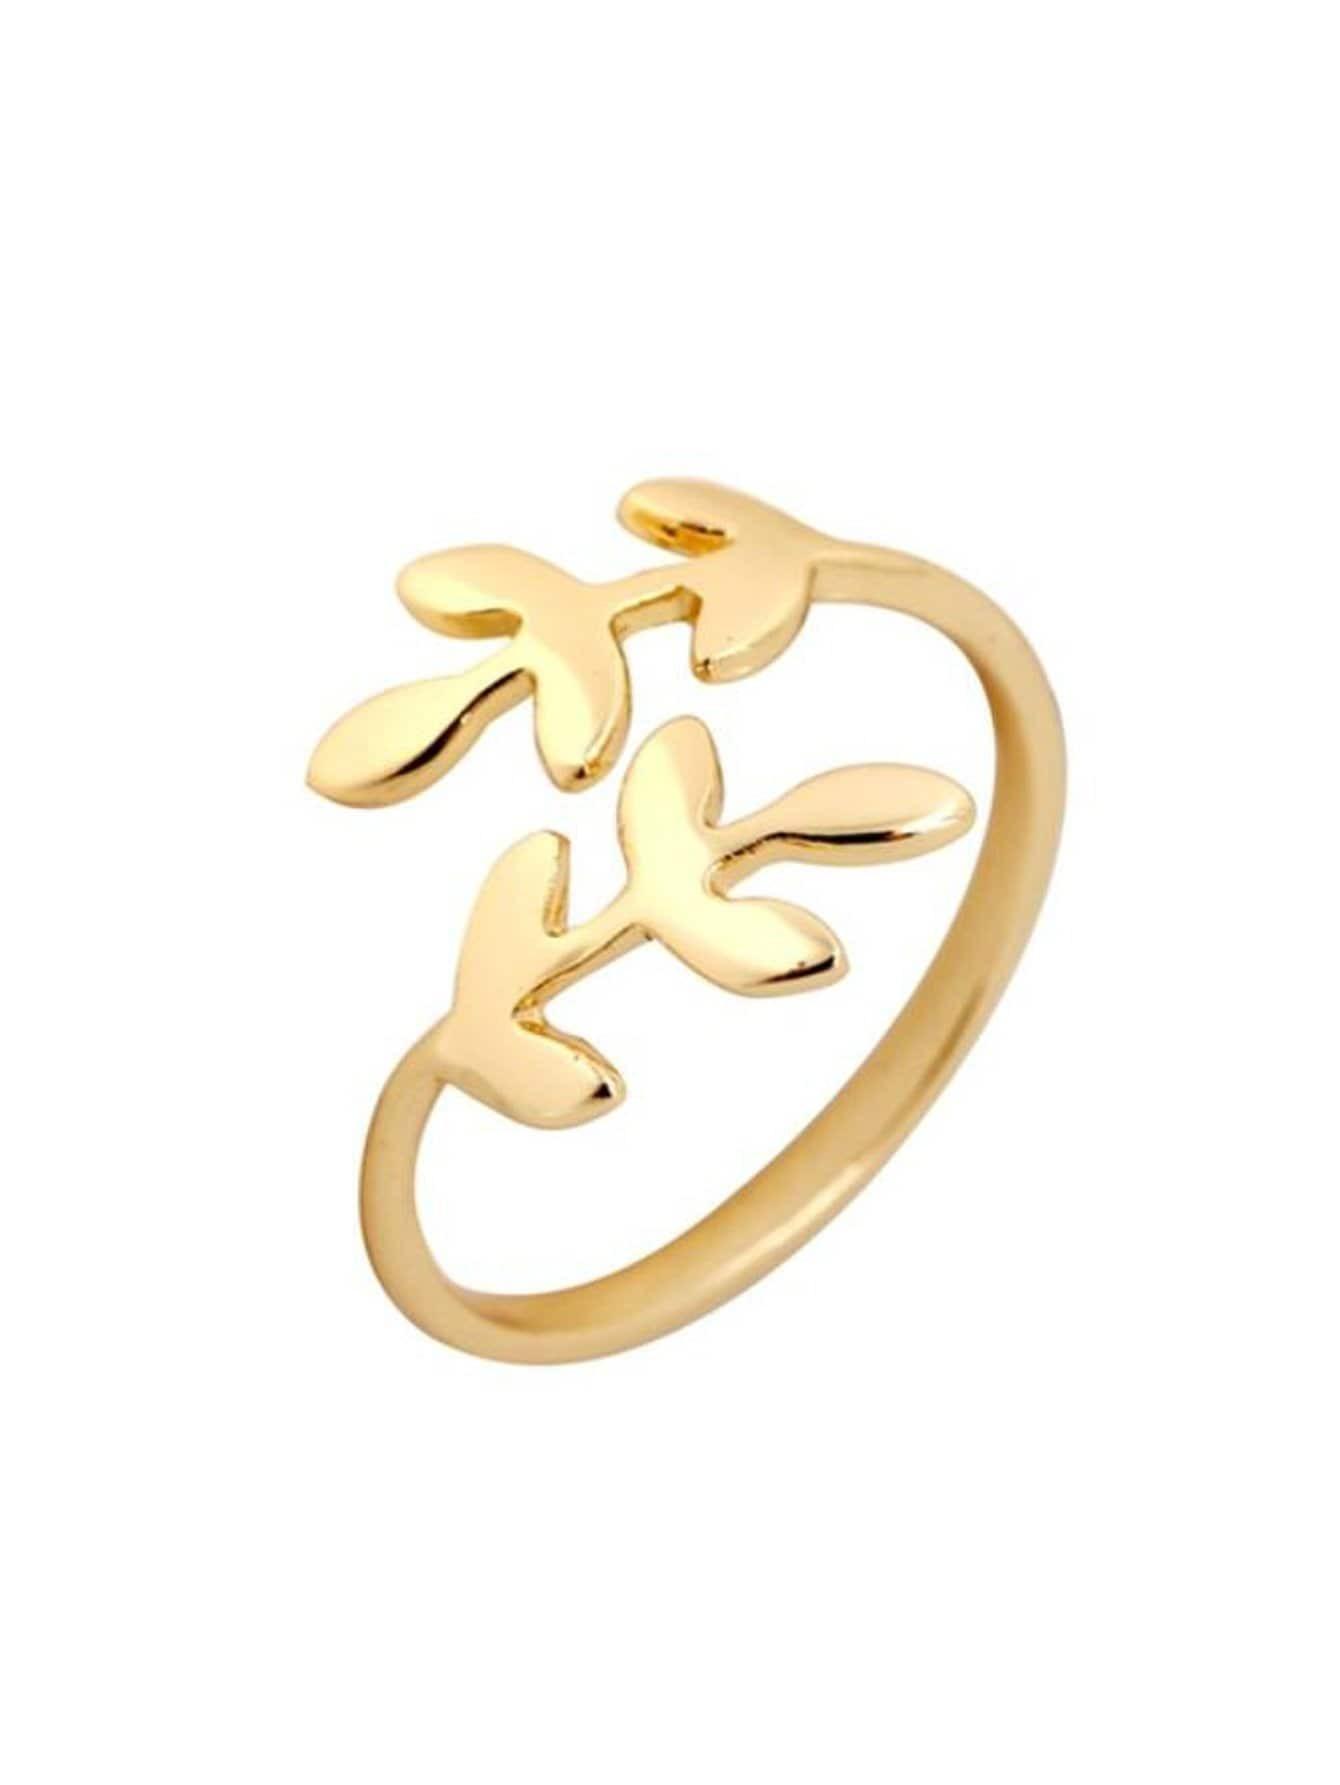 Leaf Shaped Cuff Ring filigree infinity polished cuff ring